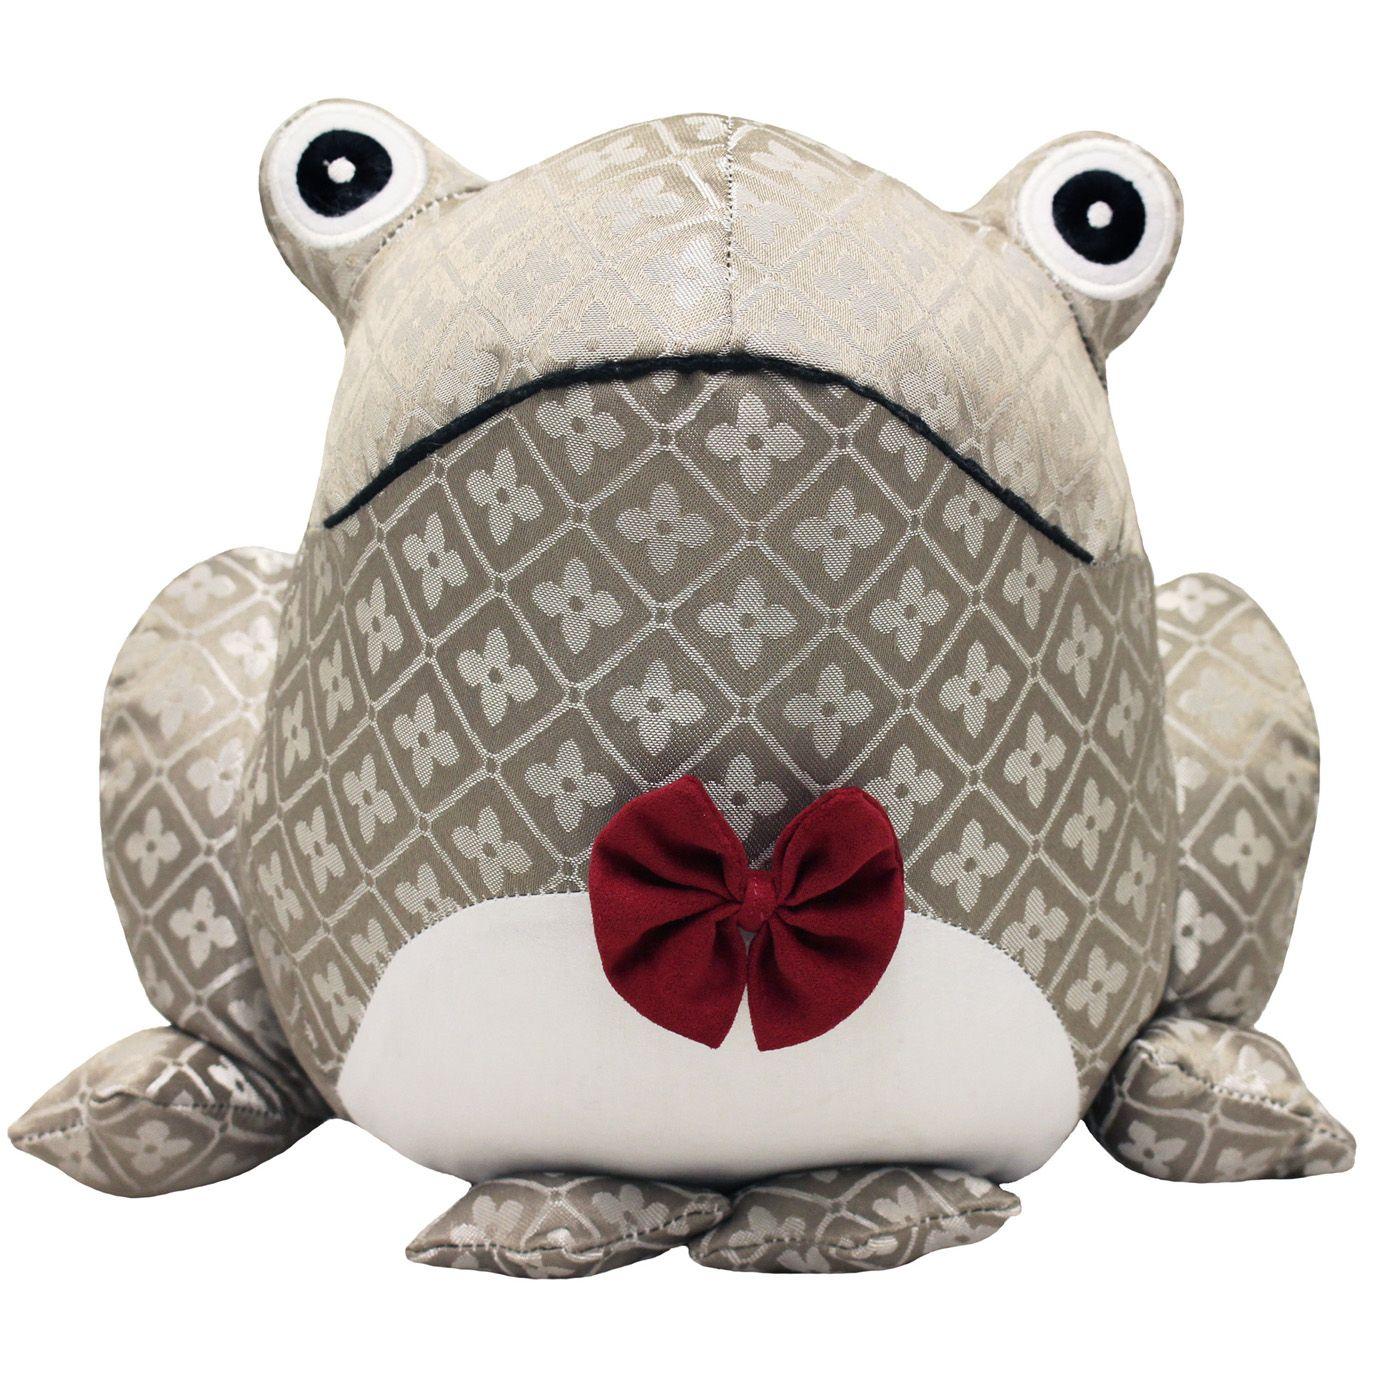 Jacquard Frog Doorstop, Multi